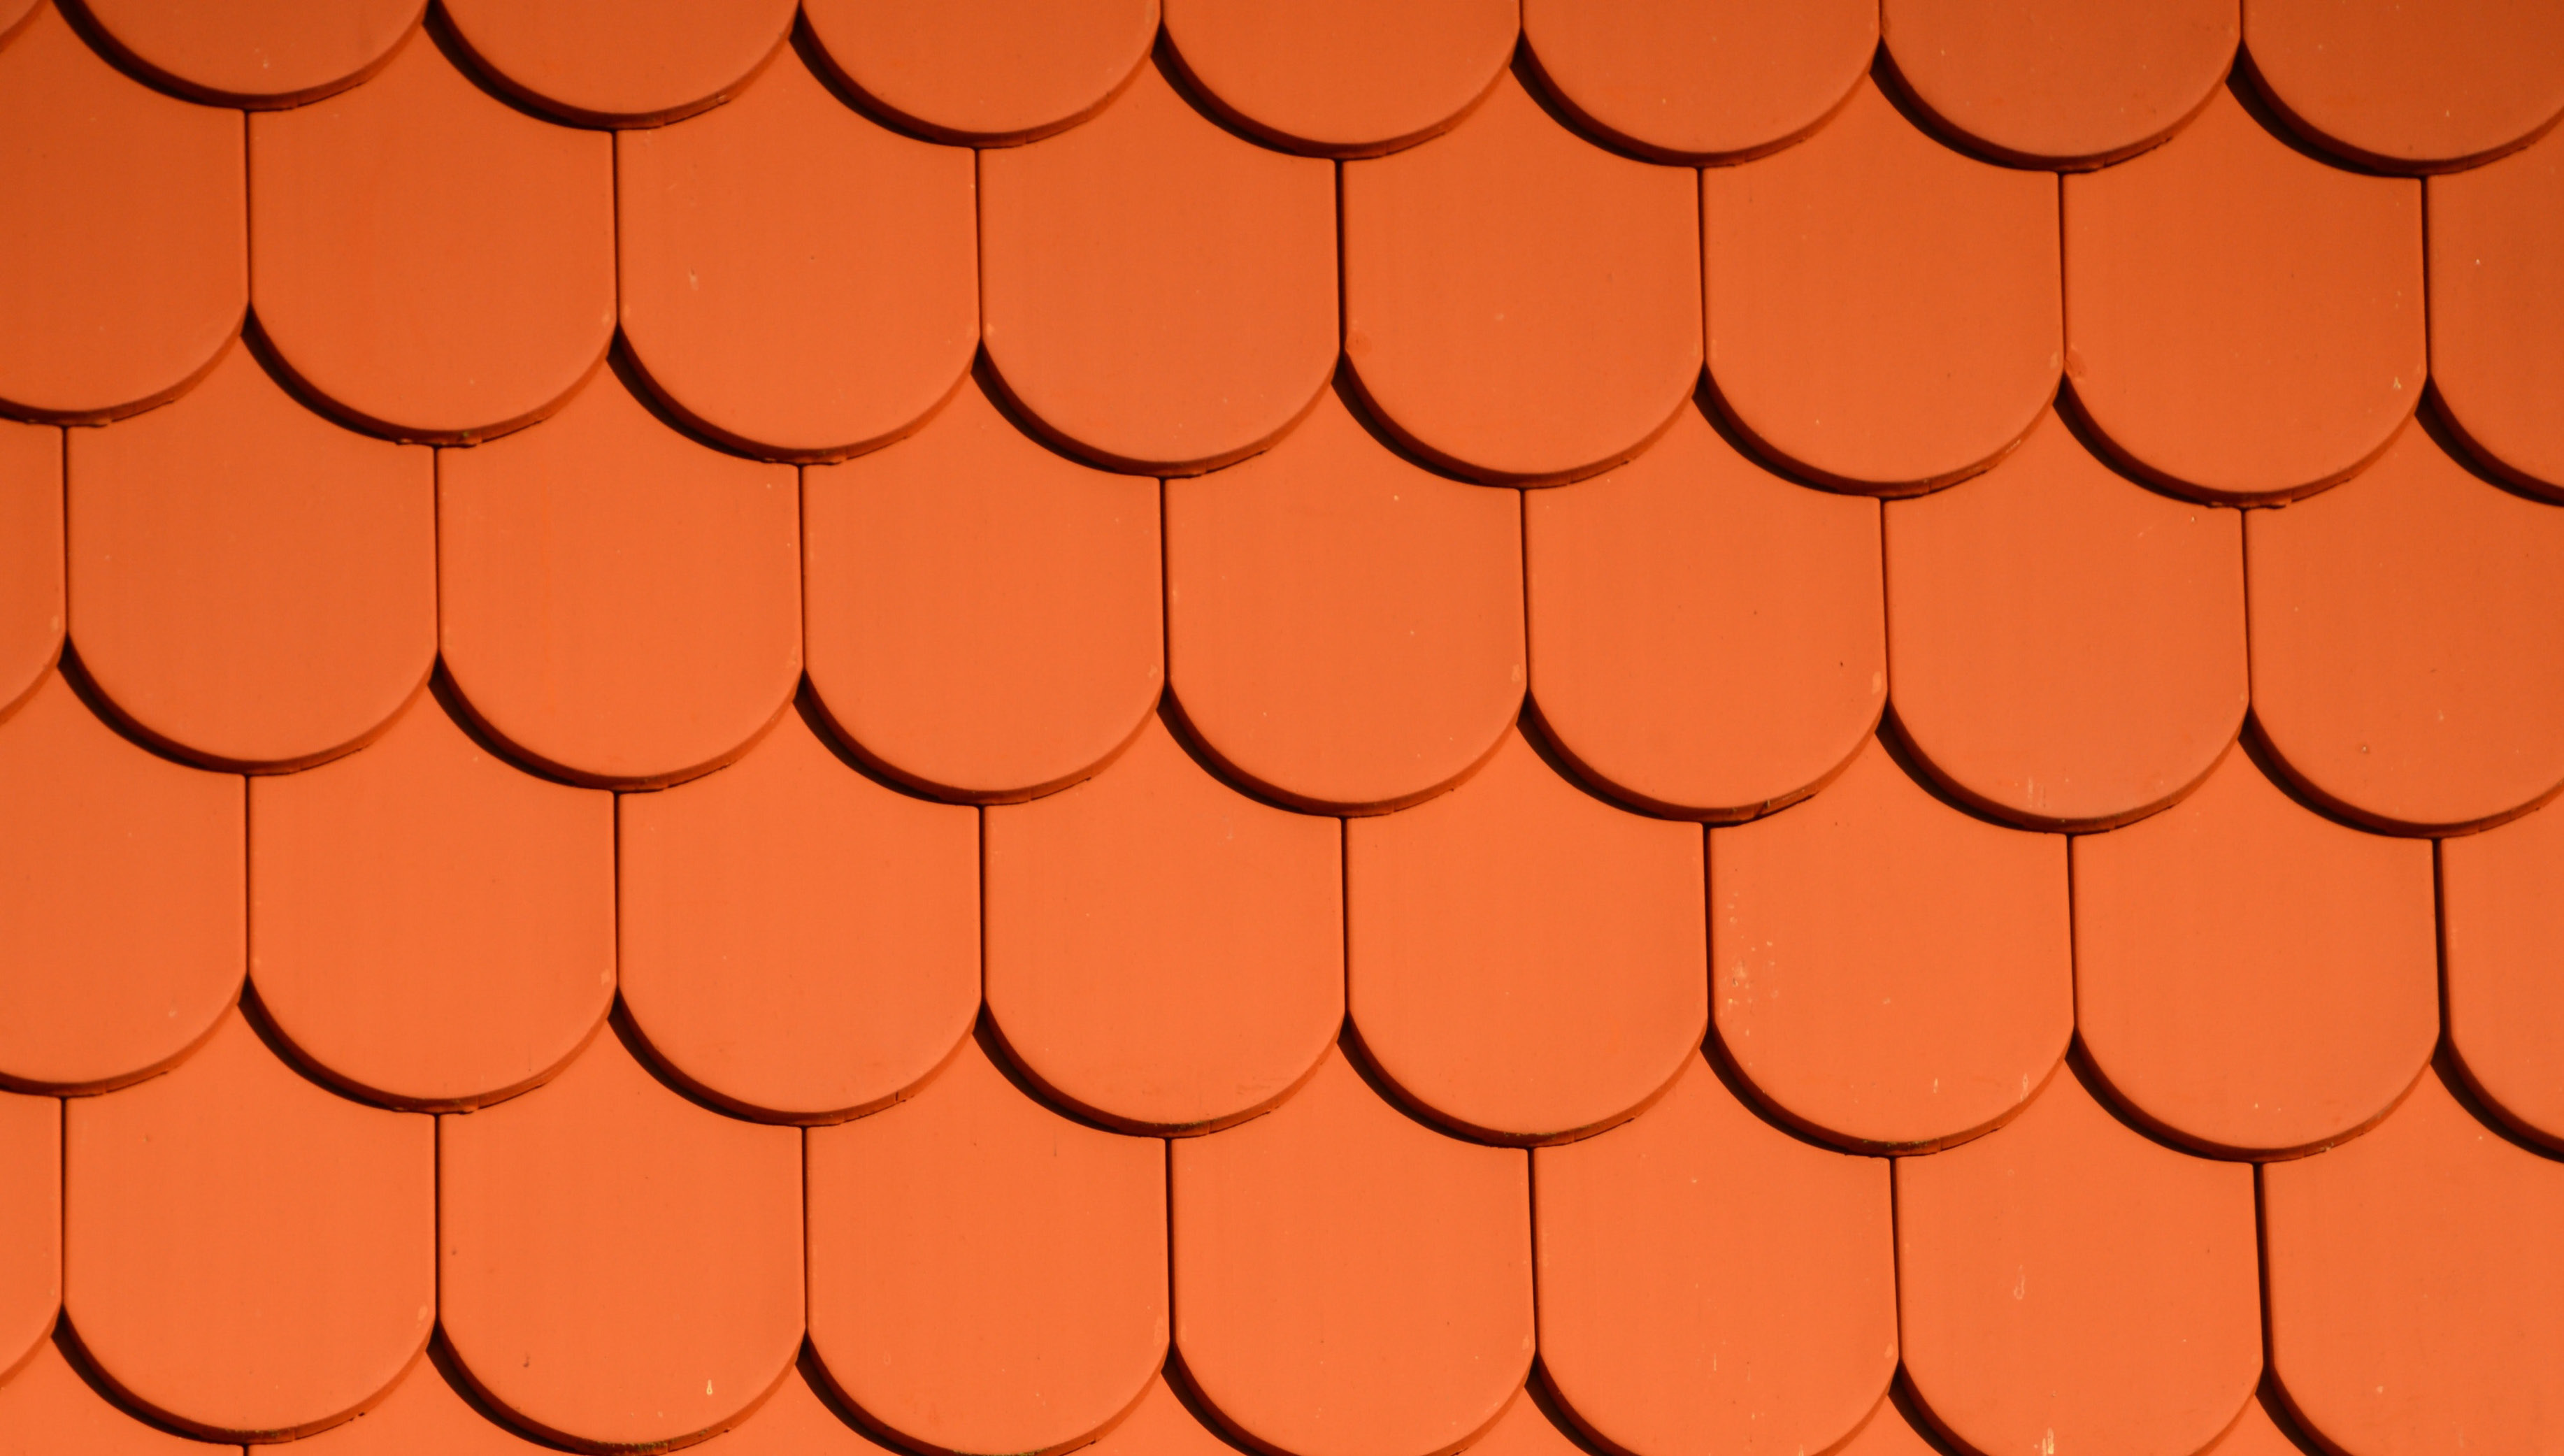 Katera strešna kritina je idealna za vašo streho?